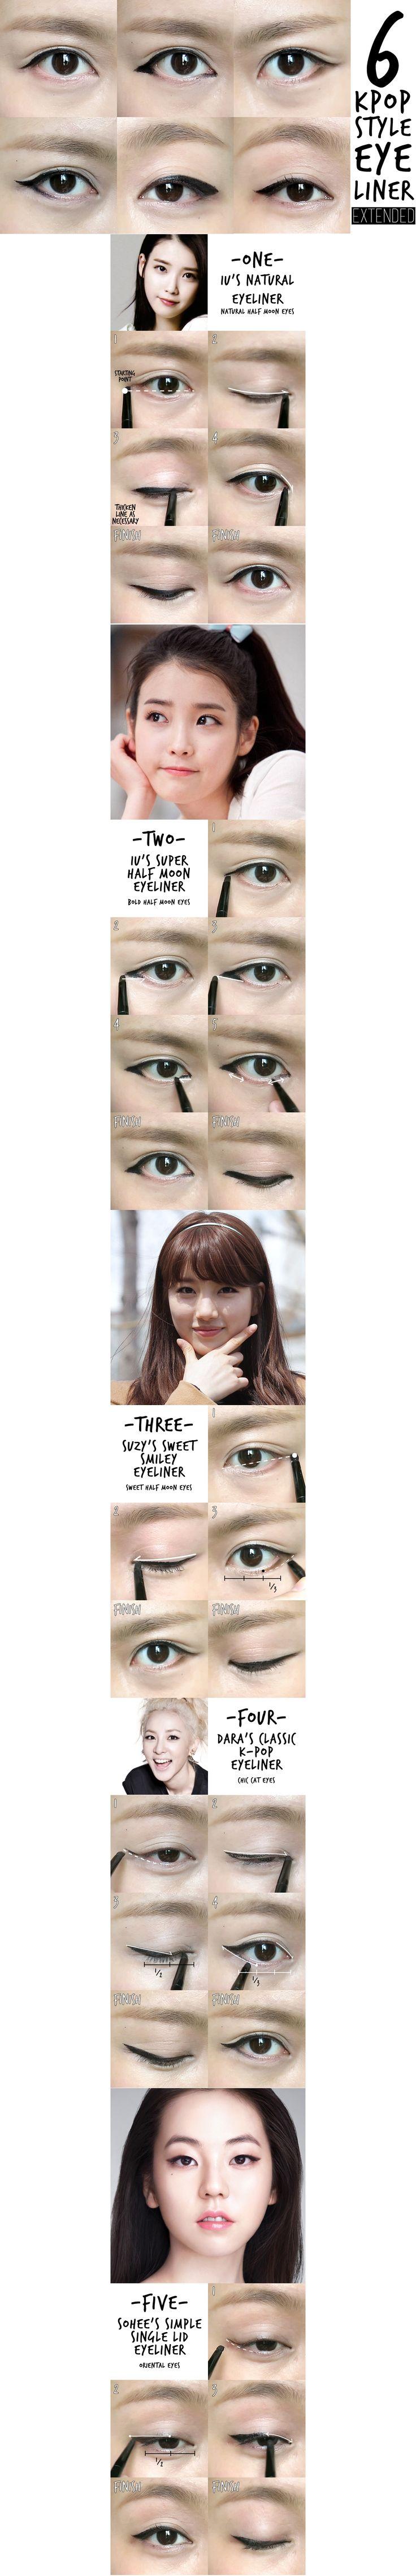 Best tutorial 6 k pop eyeliner http://amzn.to/2tGUGWx